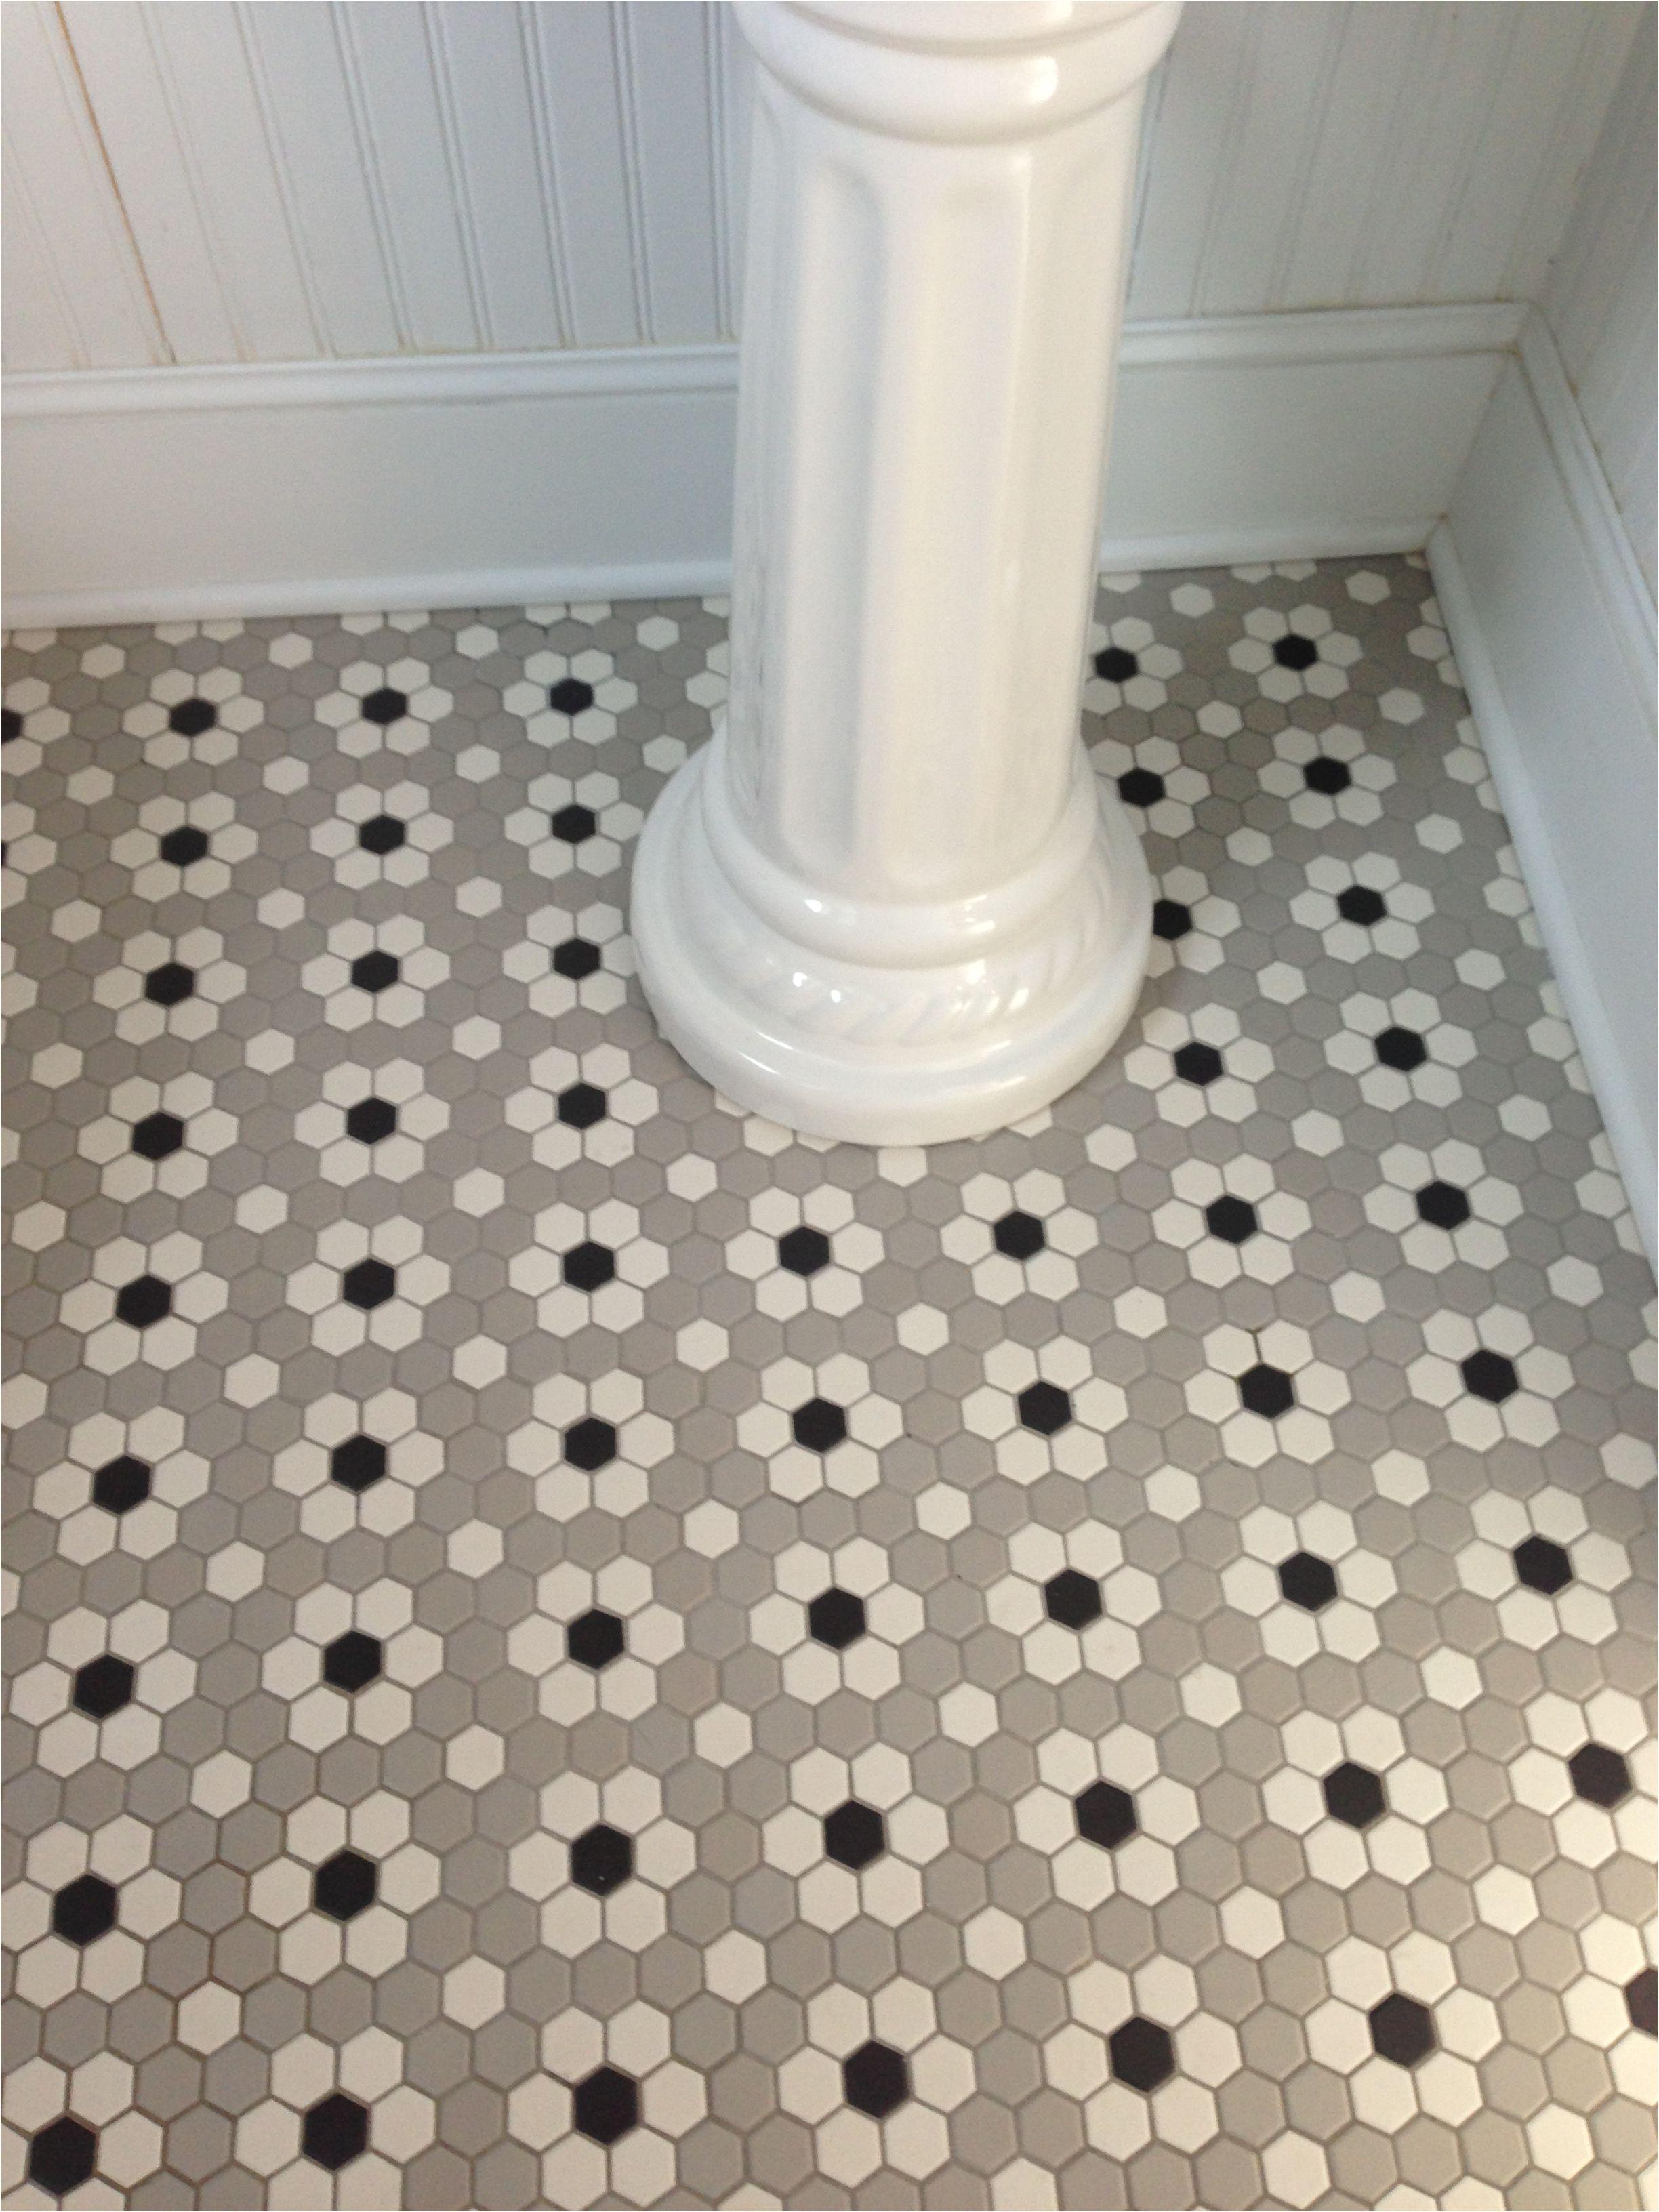 ceramic mosaic hex tile photo of ceramic mosaic hex tile we installed in our main floor half bath